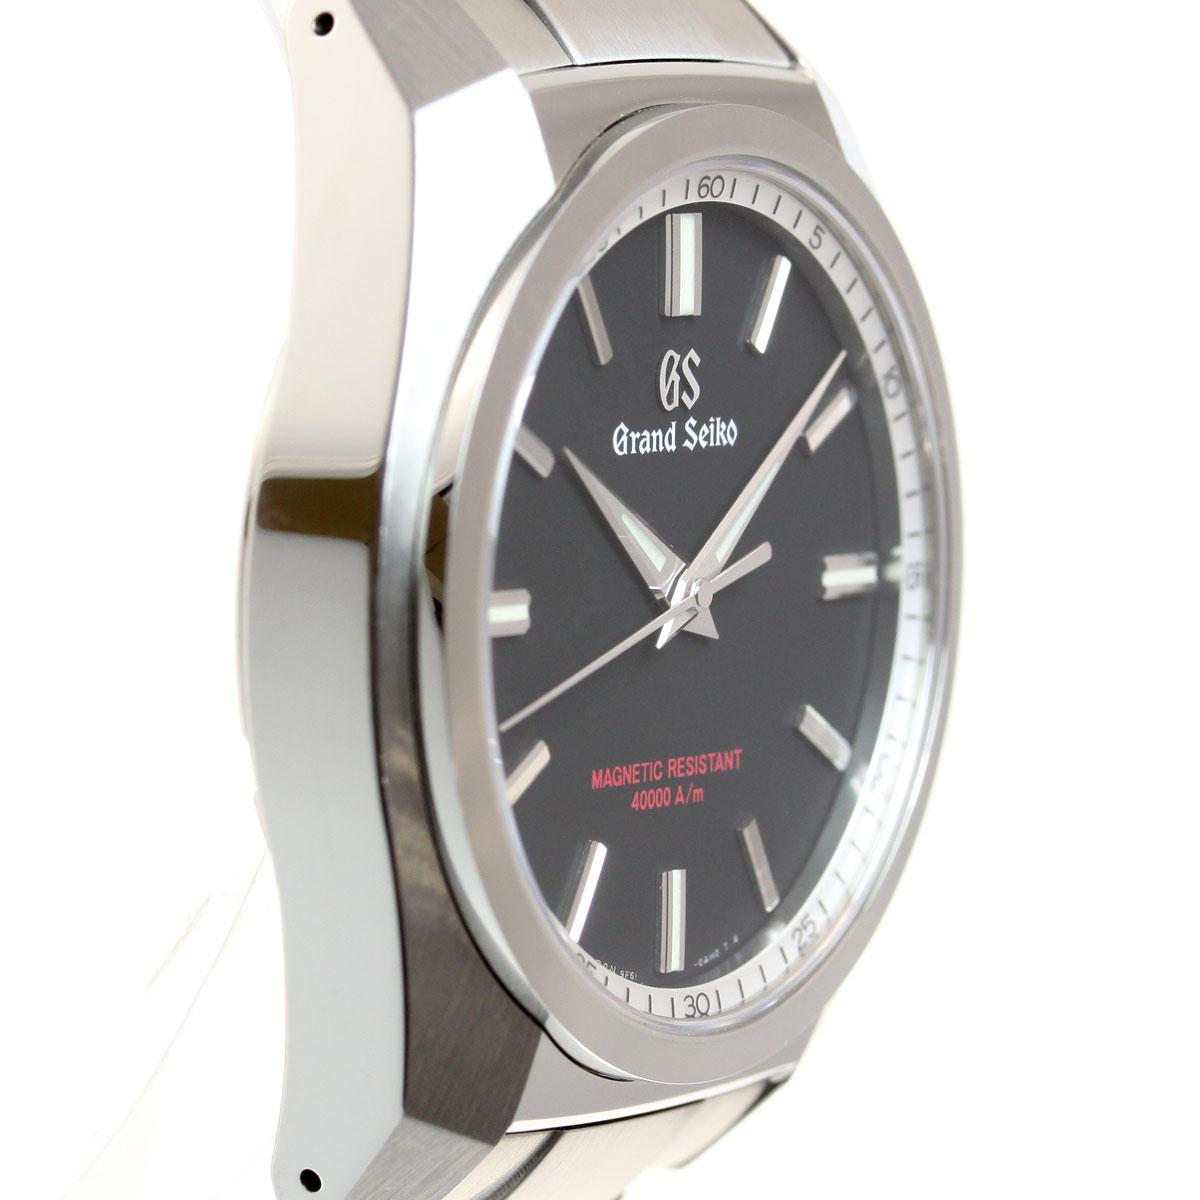 finest selection 01f2b d0499 Grand SEIKO quartz GRAND SEIKO 強化耐磁 model watch men SBGX293